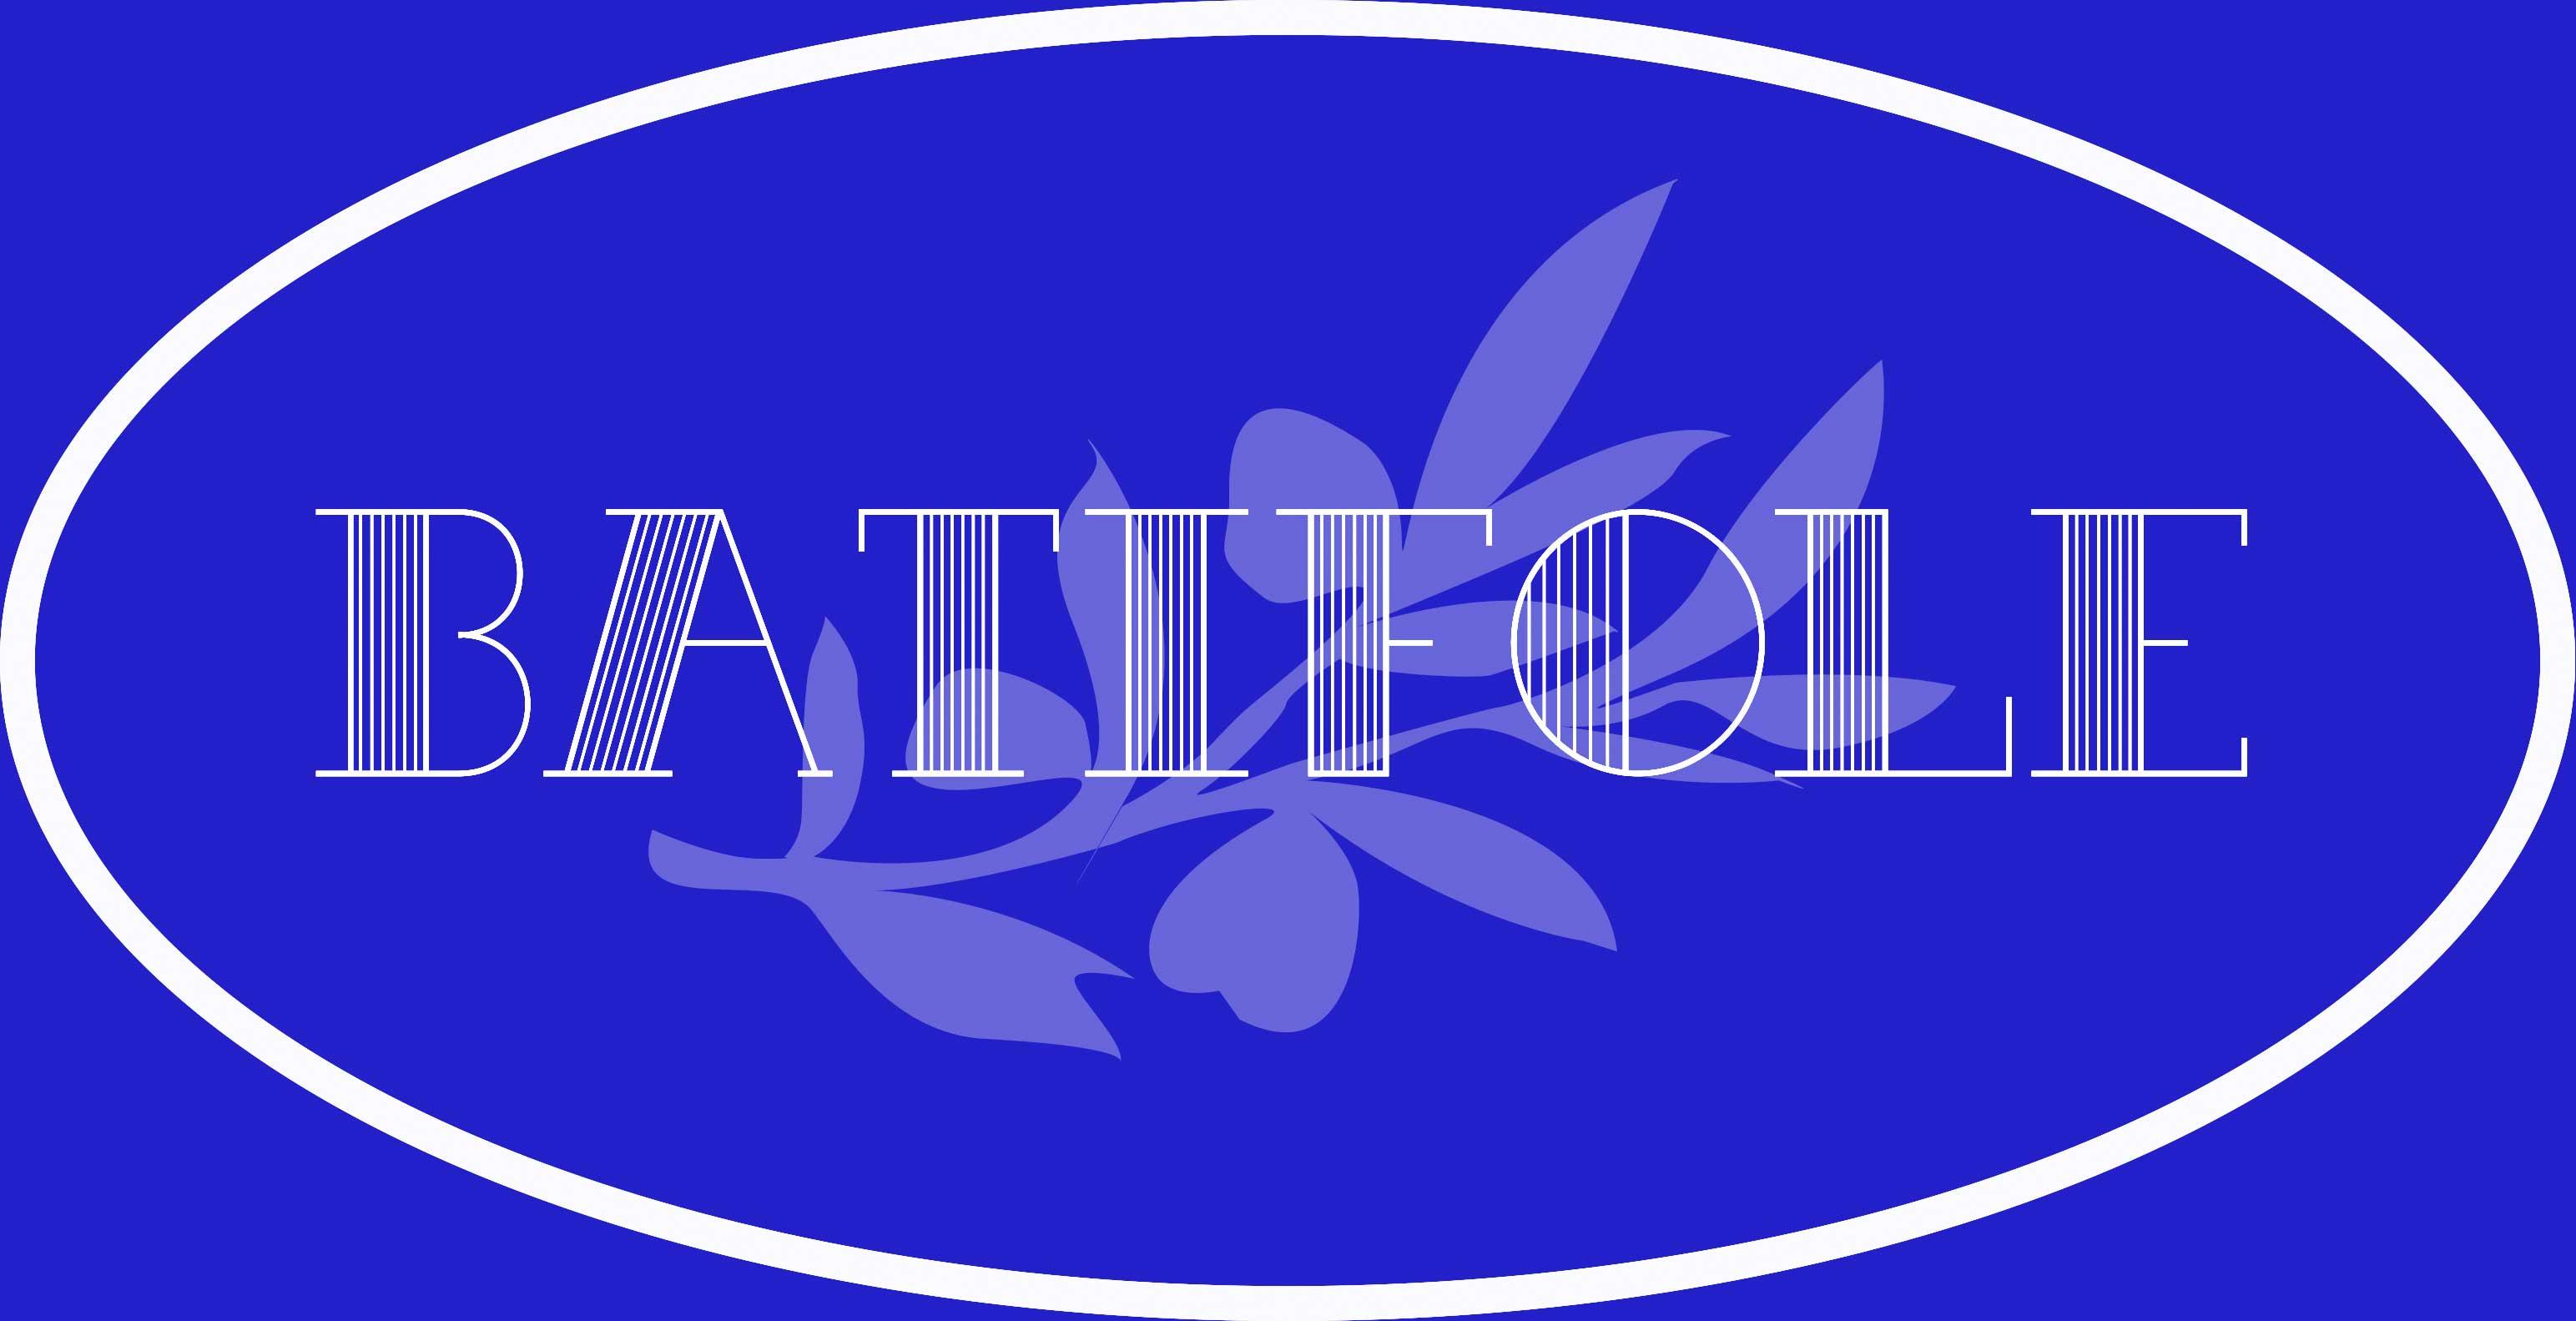 Batifole